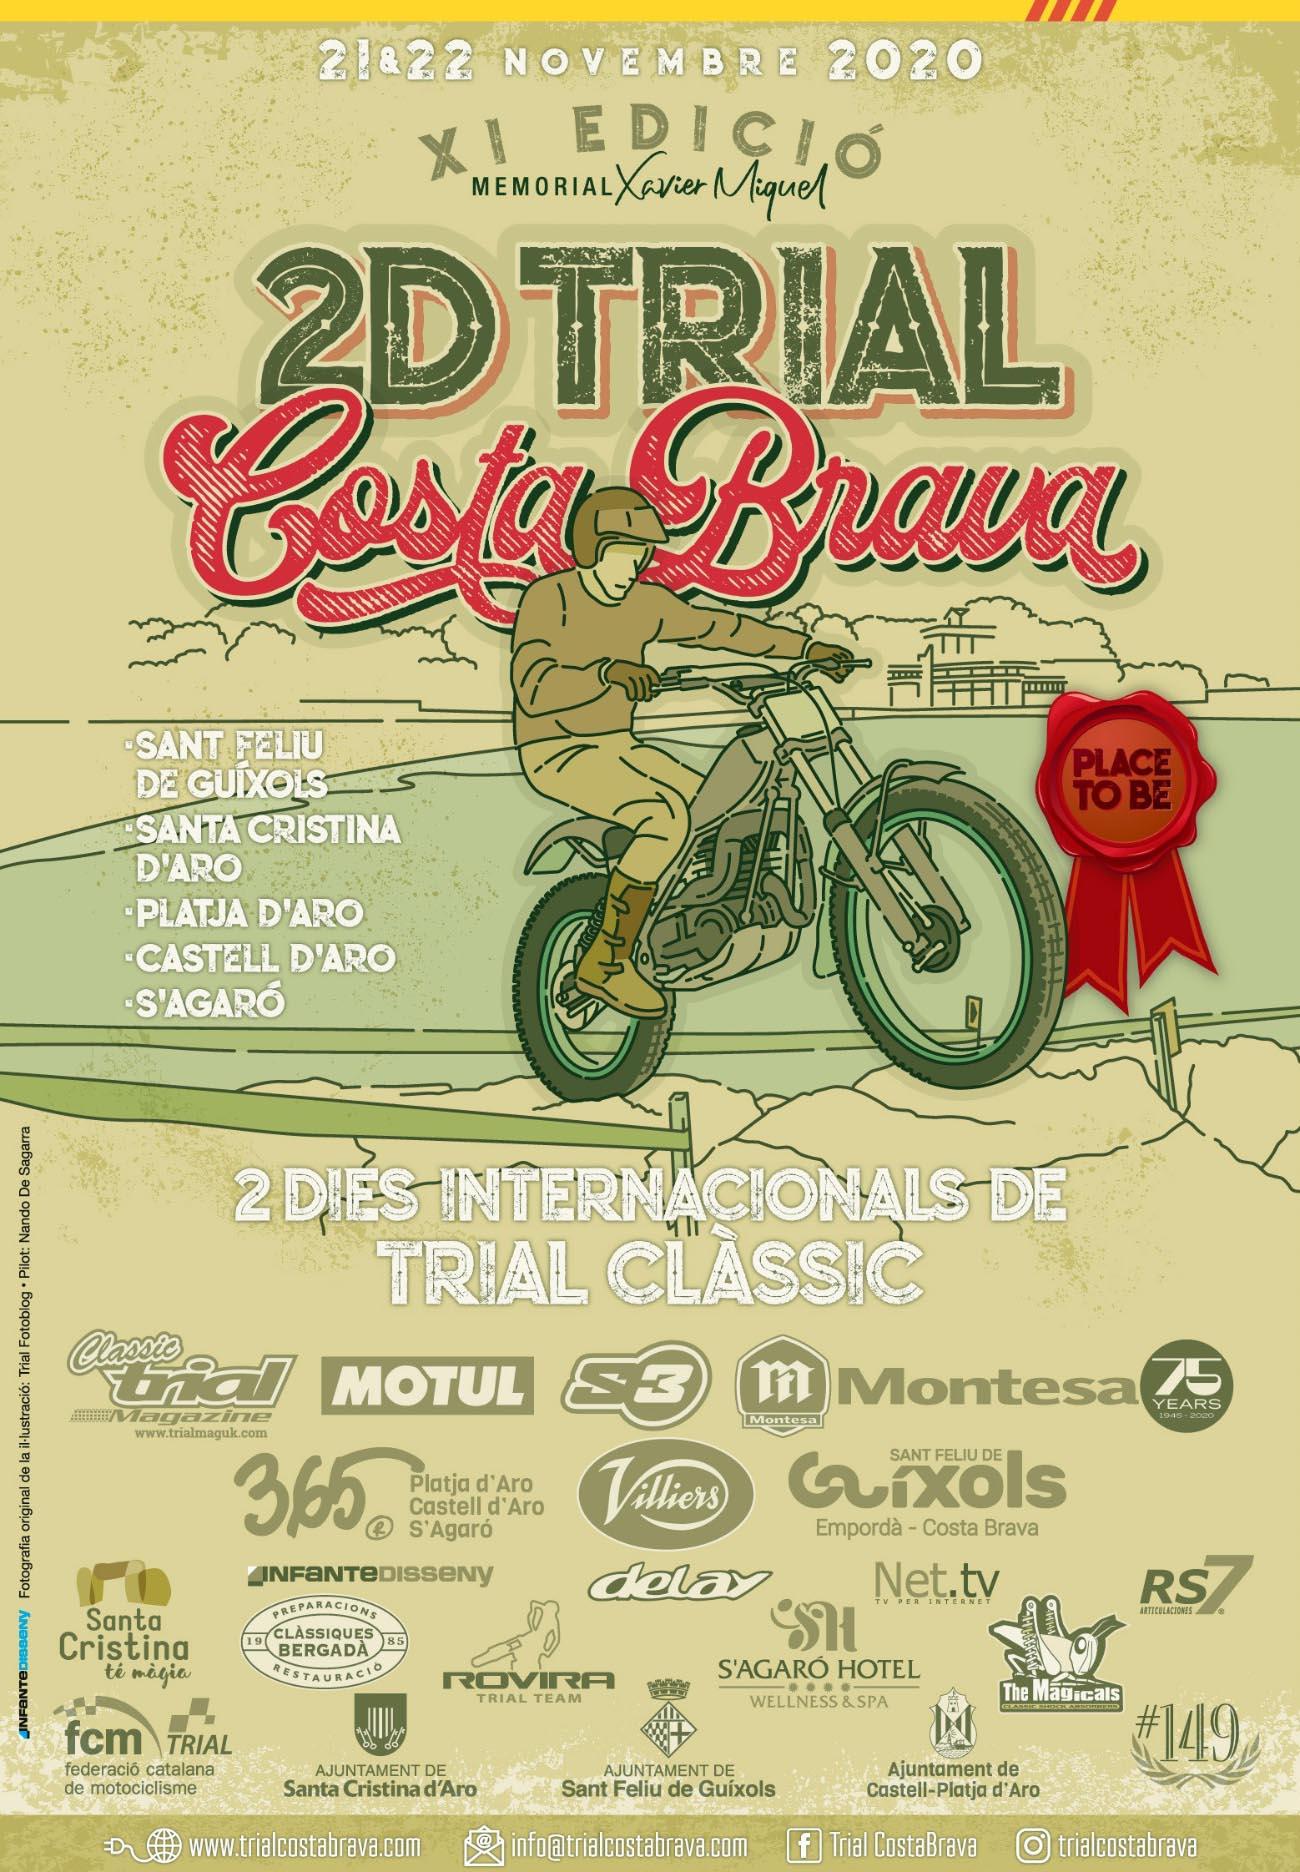 2d trial Costa Brava 2020